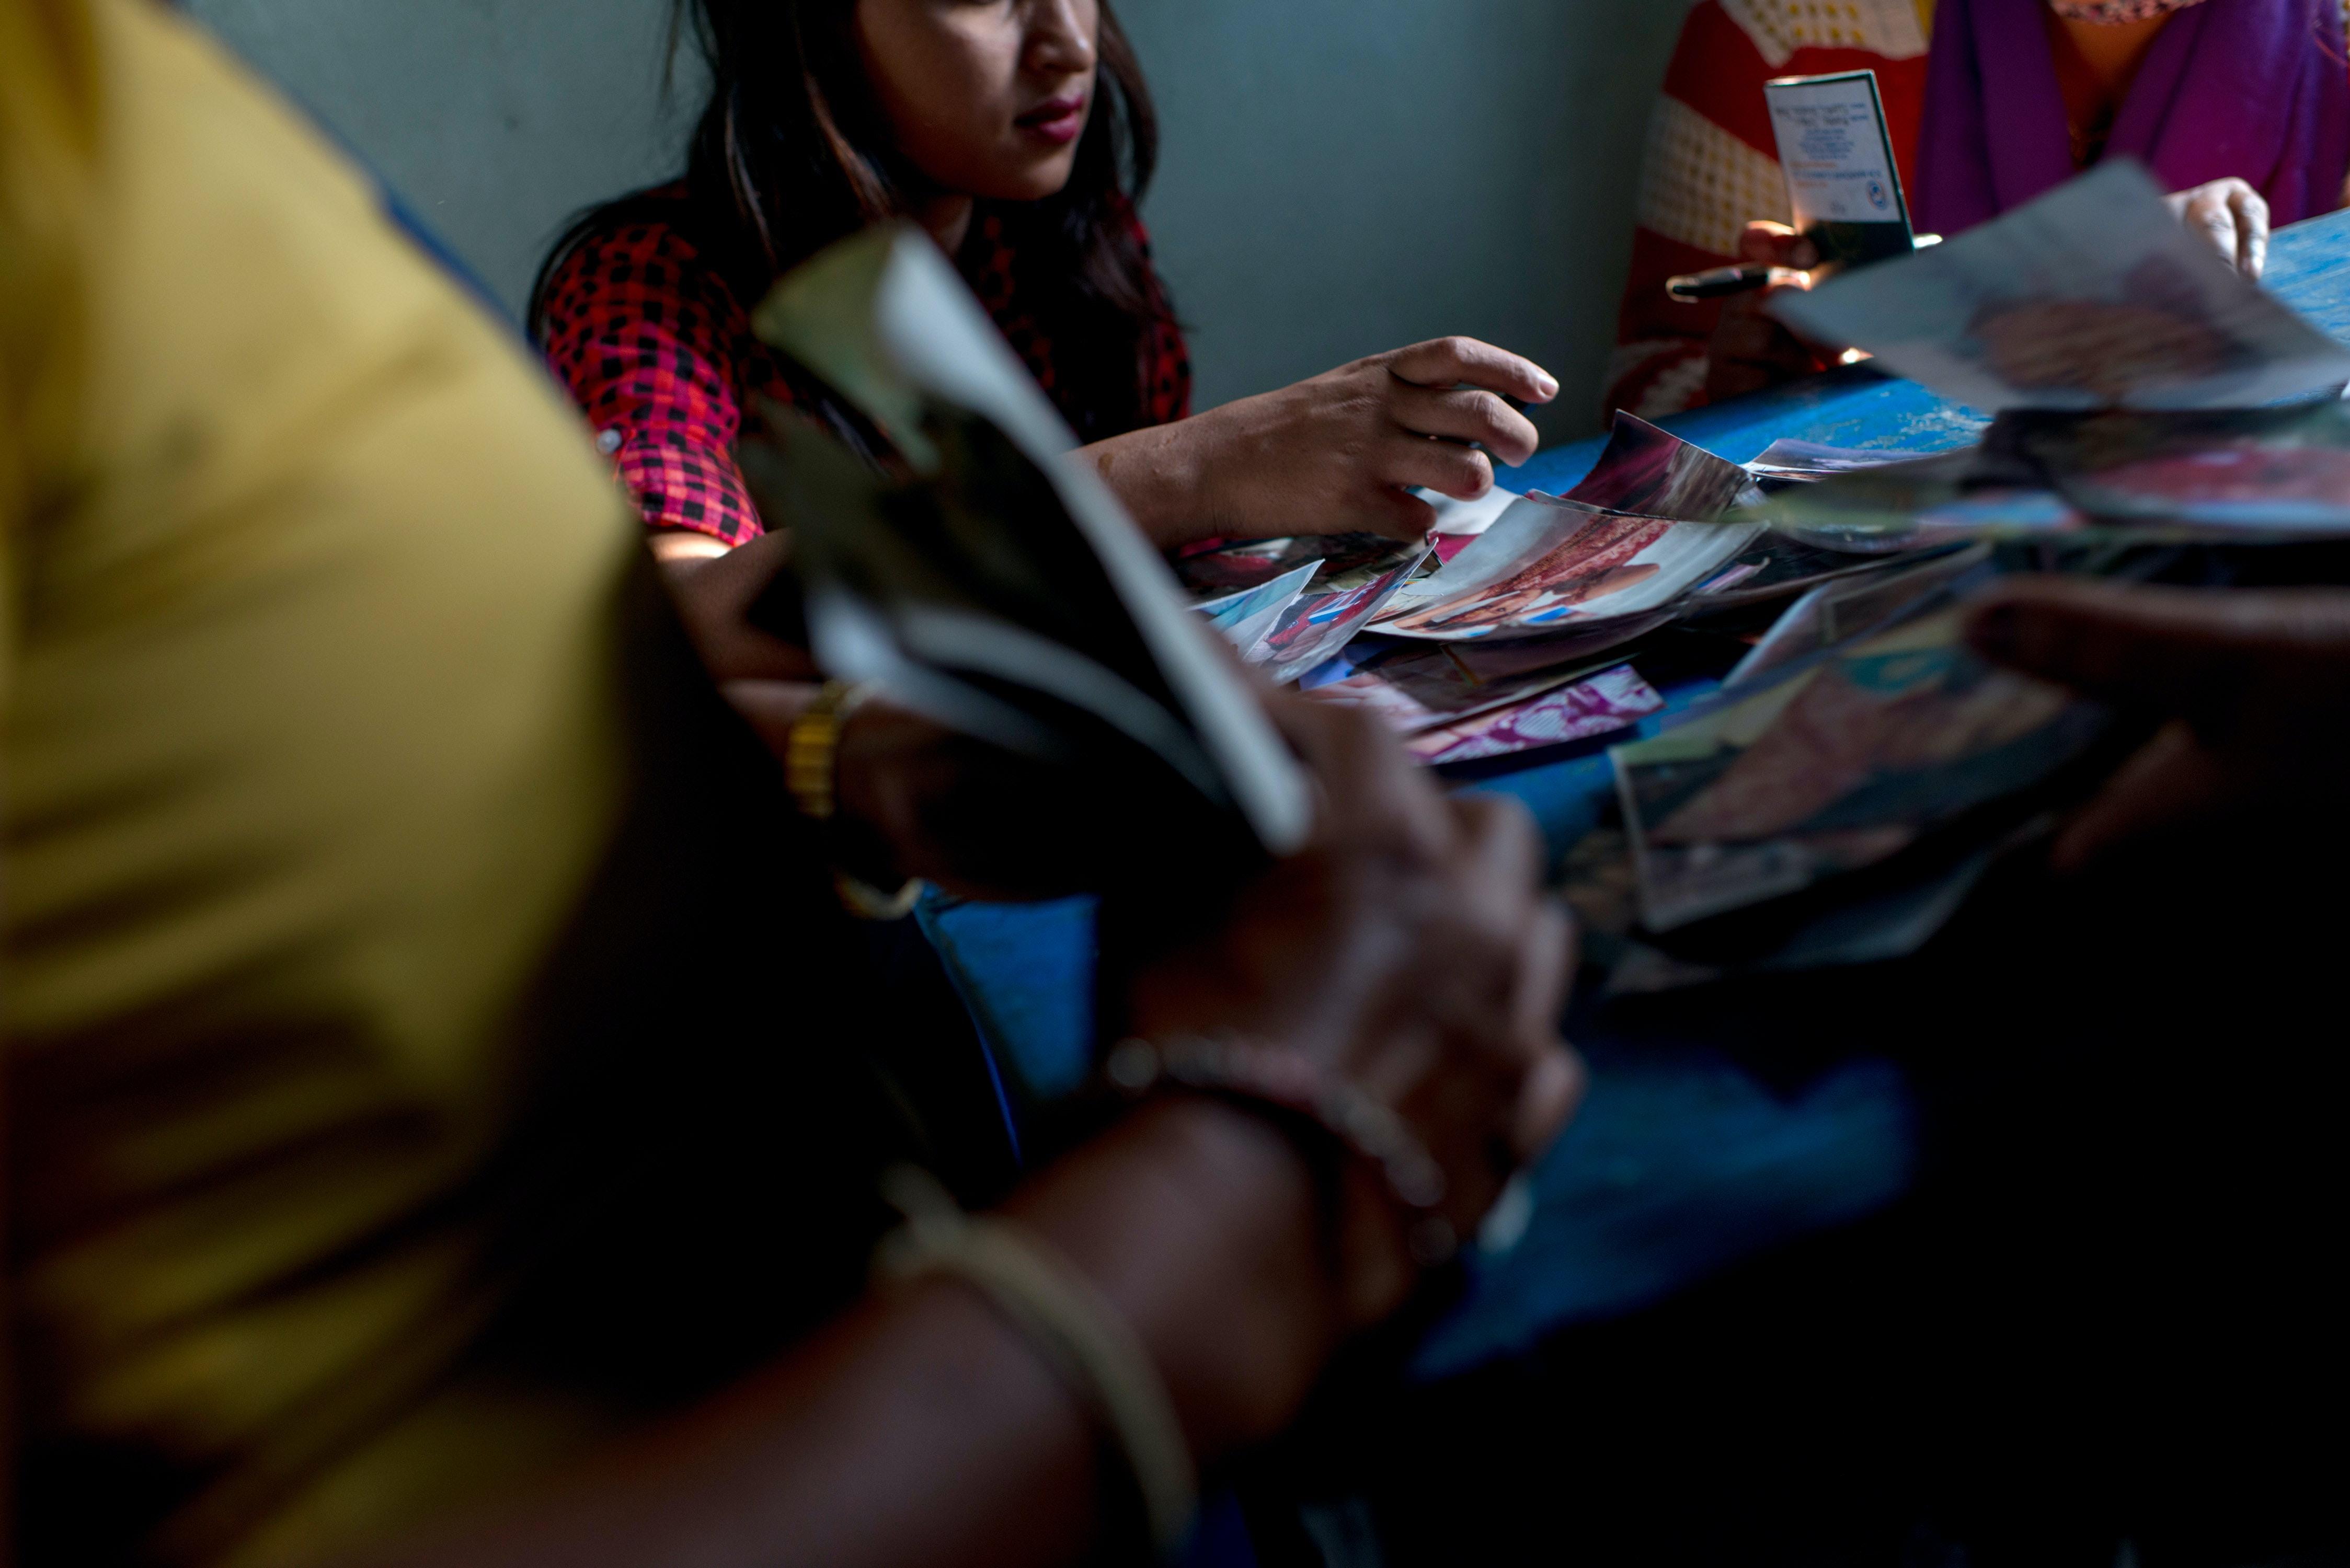 13 Sex Trafficking Statistics That Put The Worldwide Problem